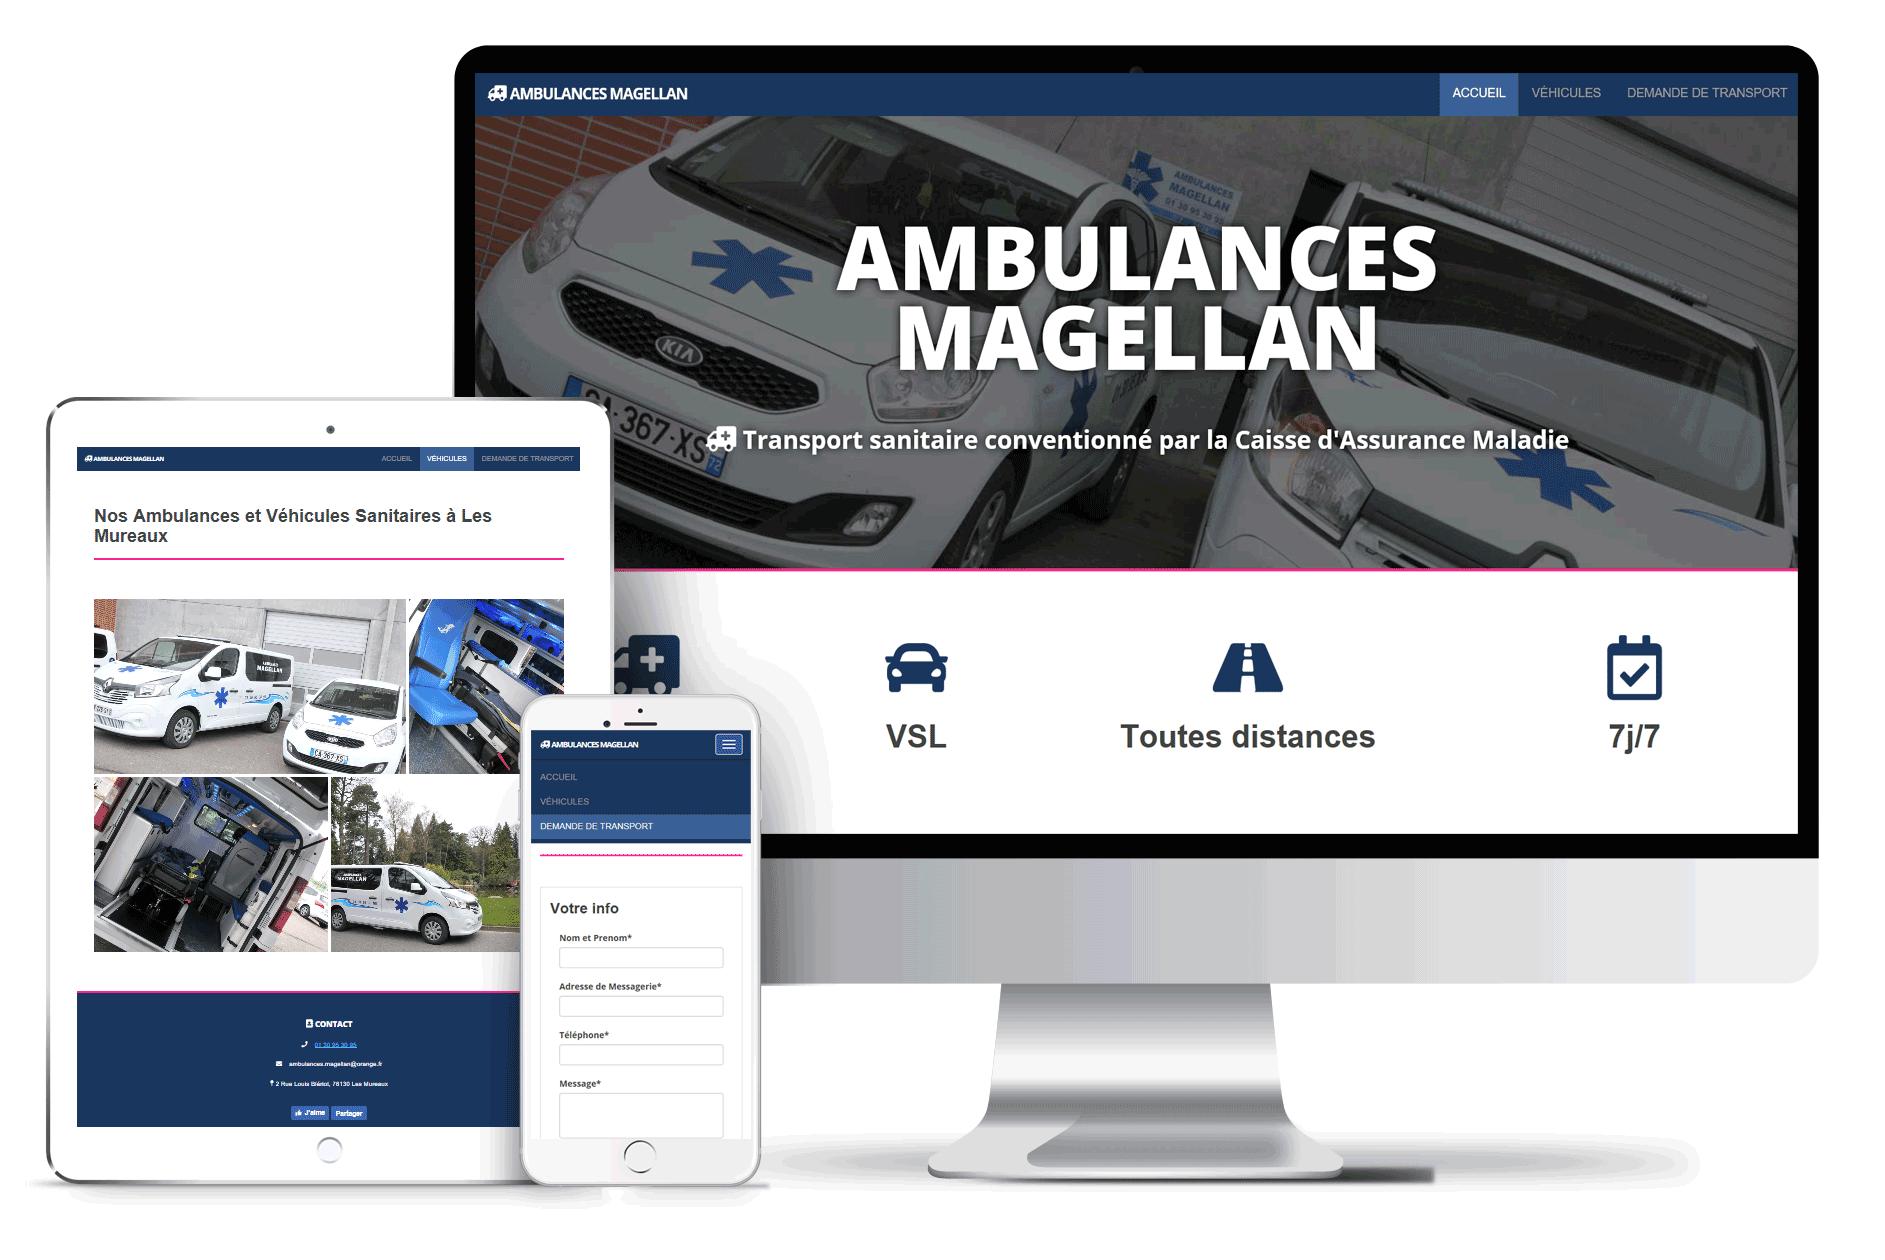 ambulances magellan mock up